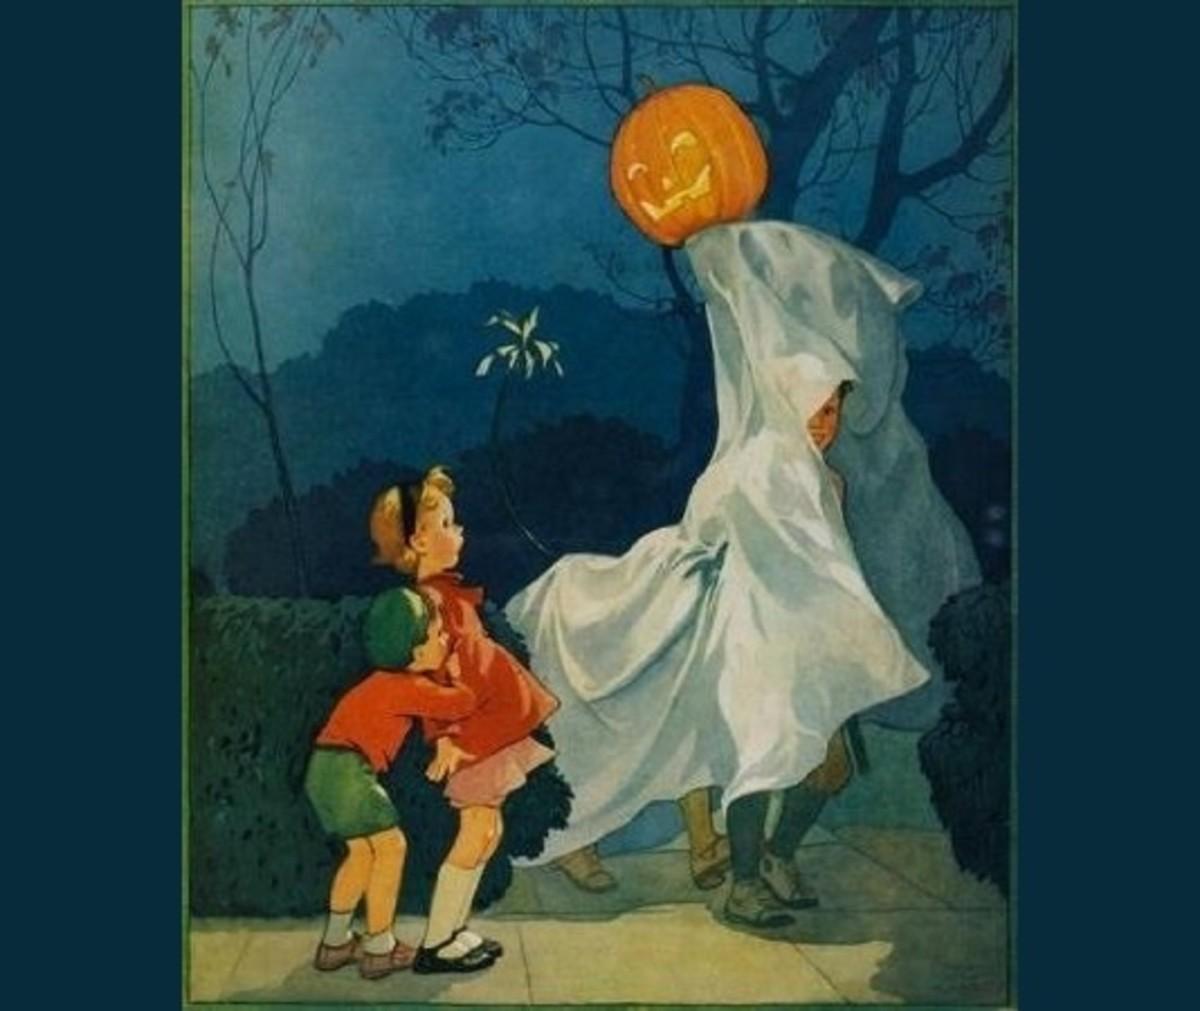 A 1950's Halloween Celebration